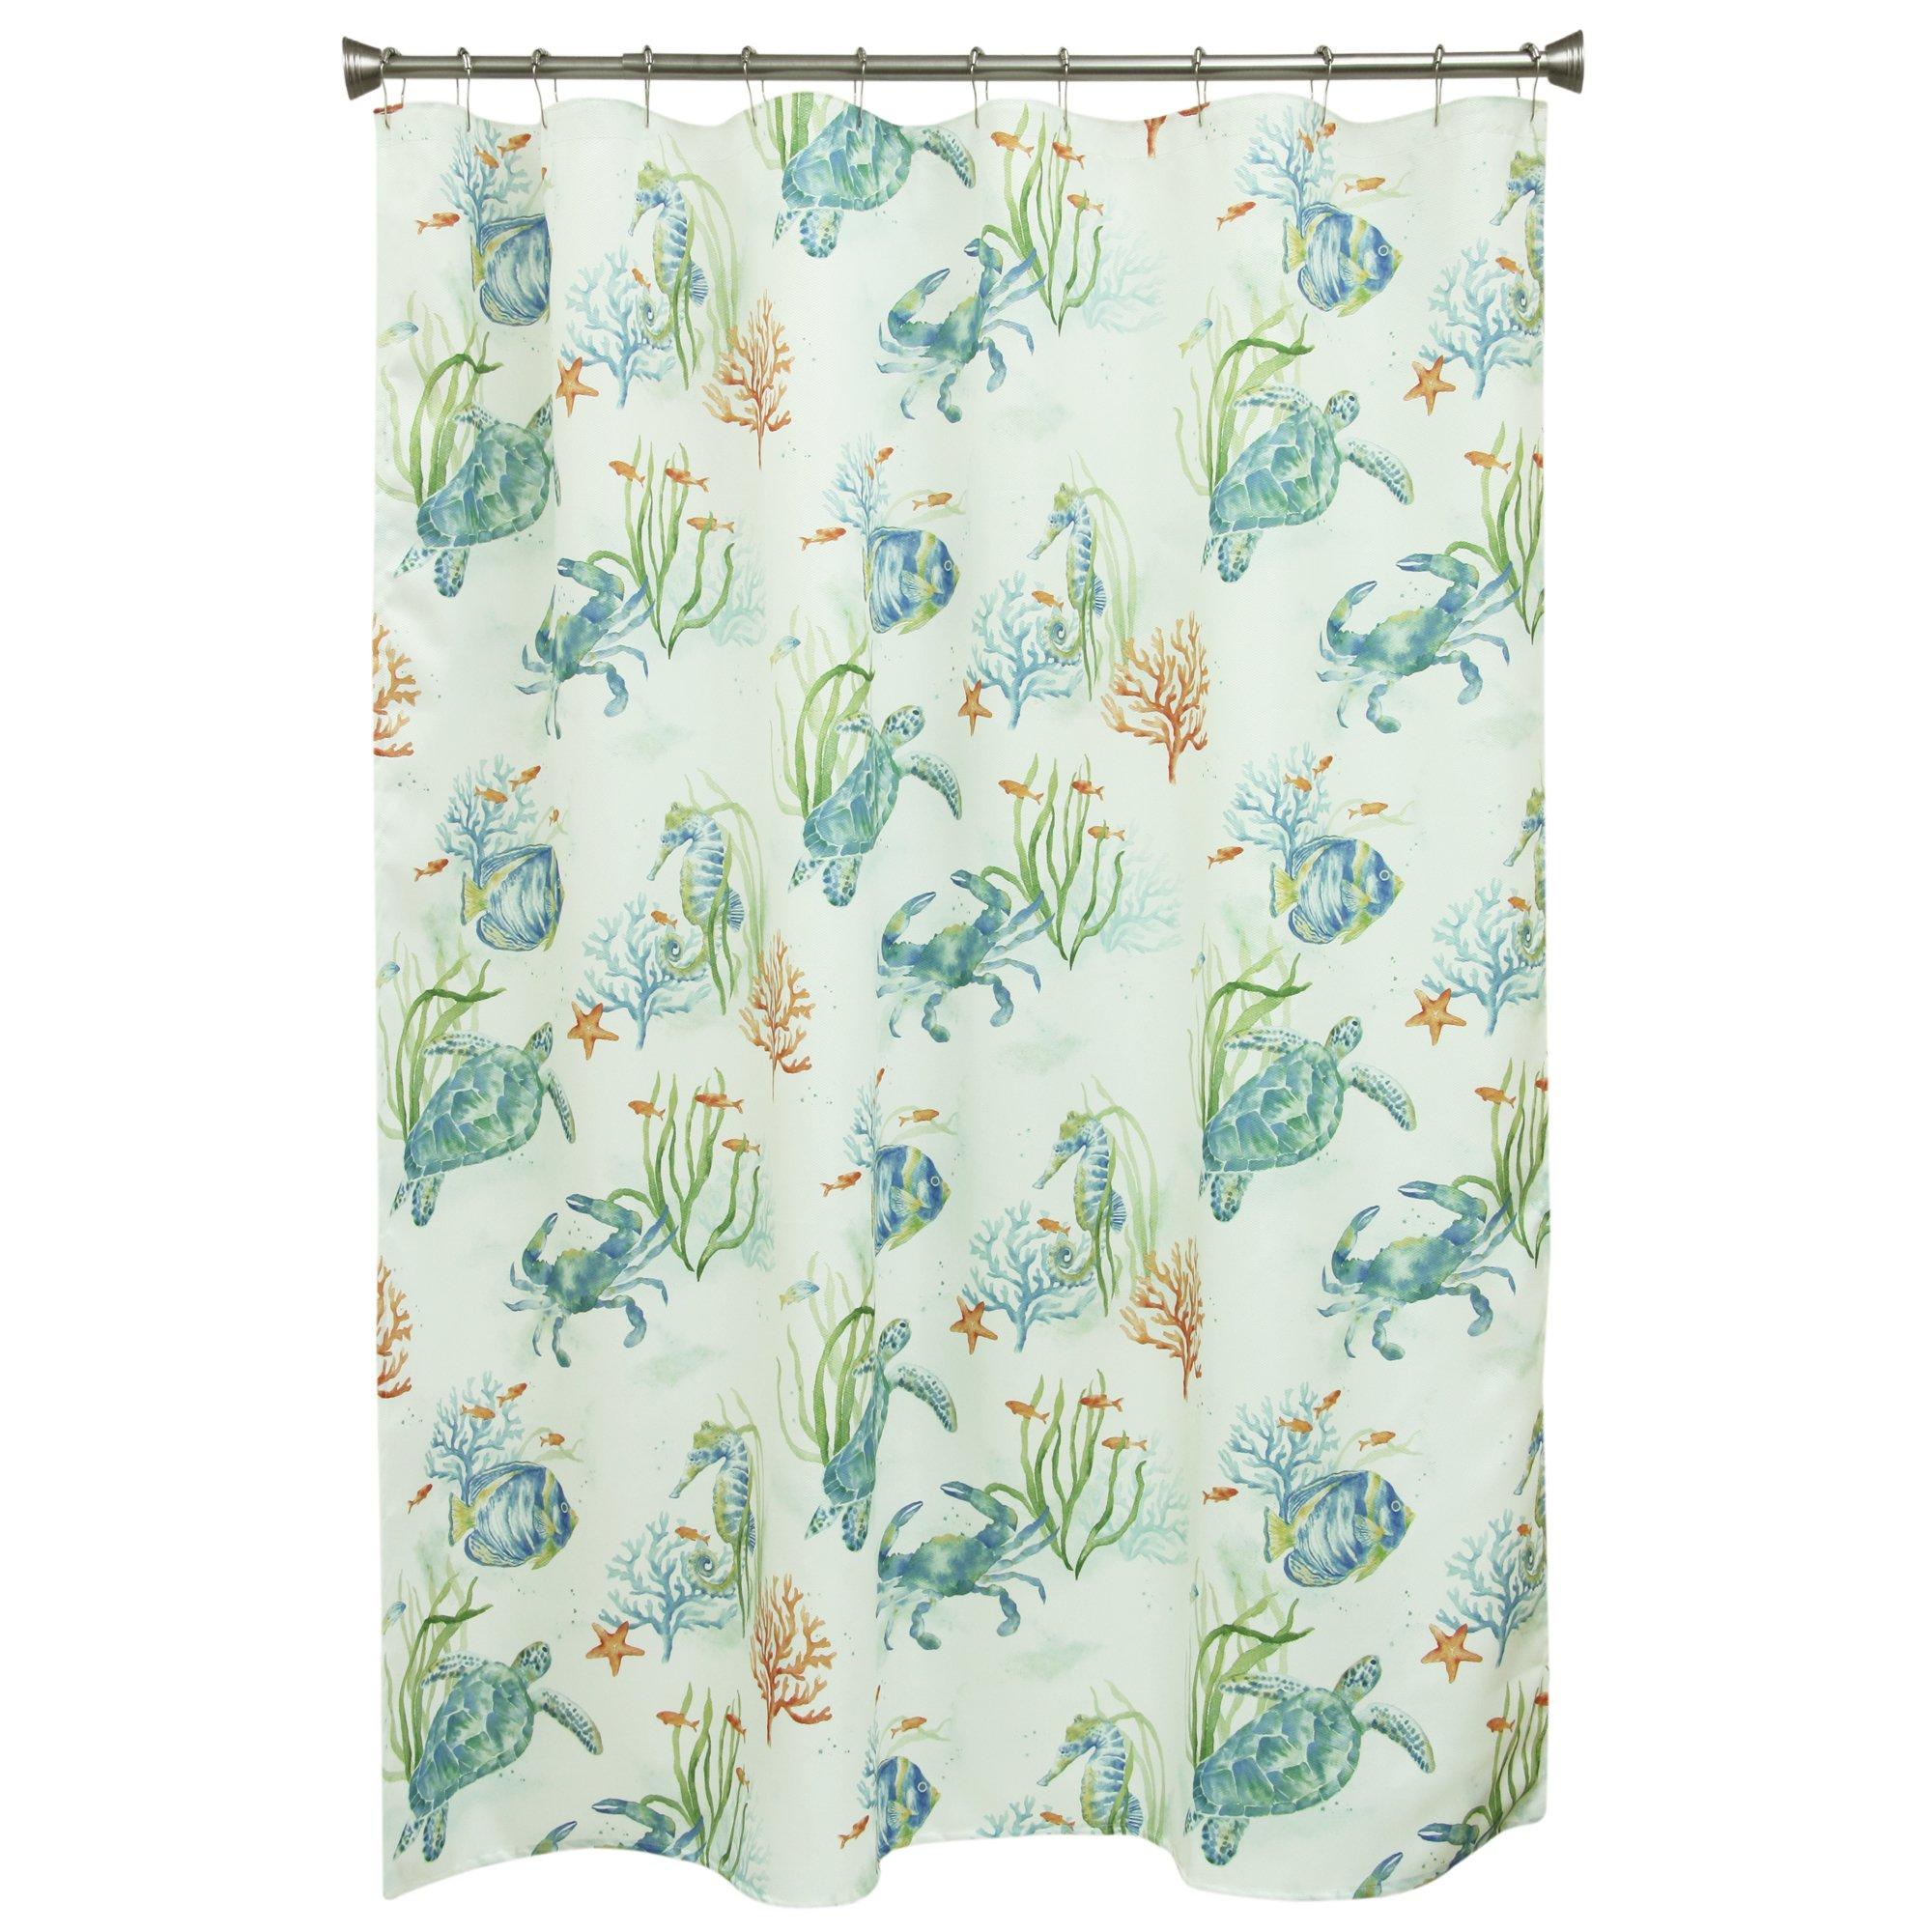 Bacova Guild 10787 Shower Curtain, Multicolor